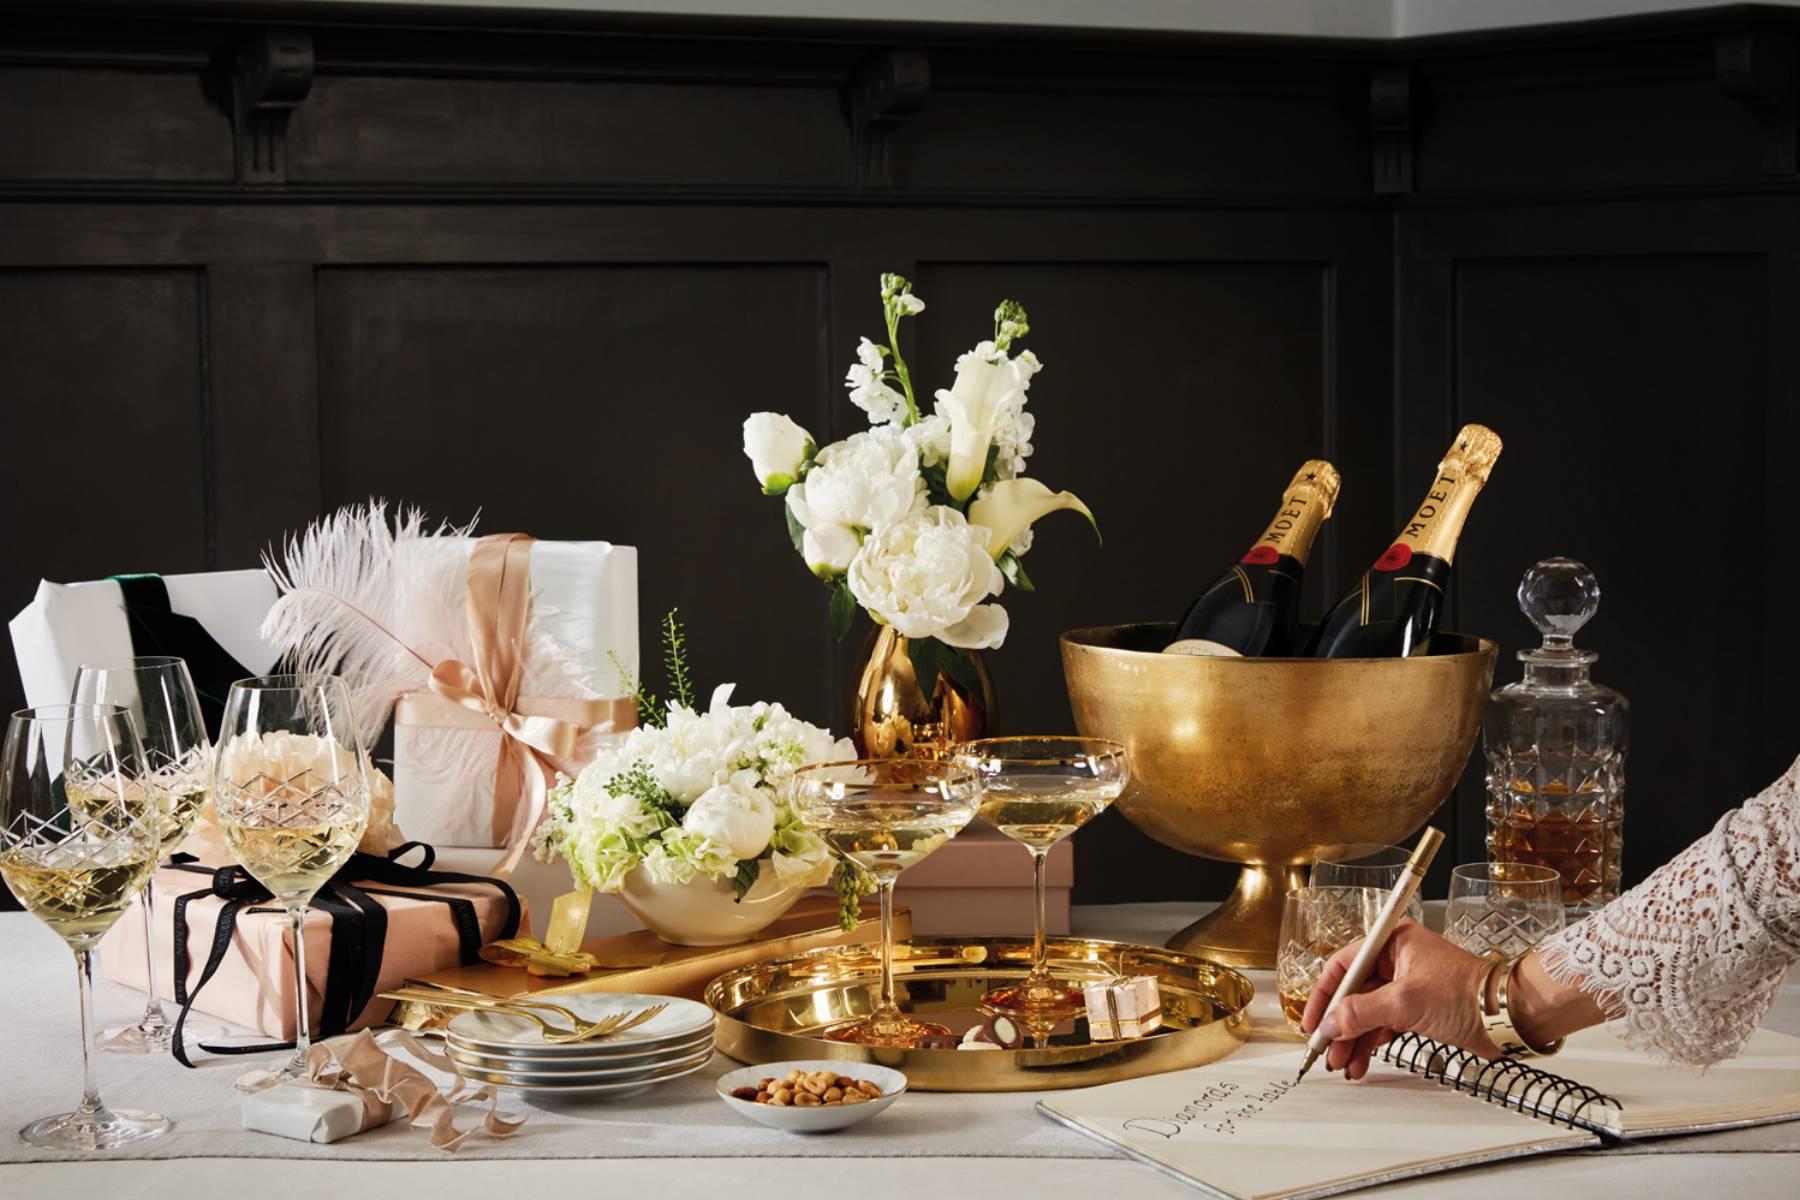 sylwestrowy stół